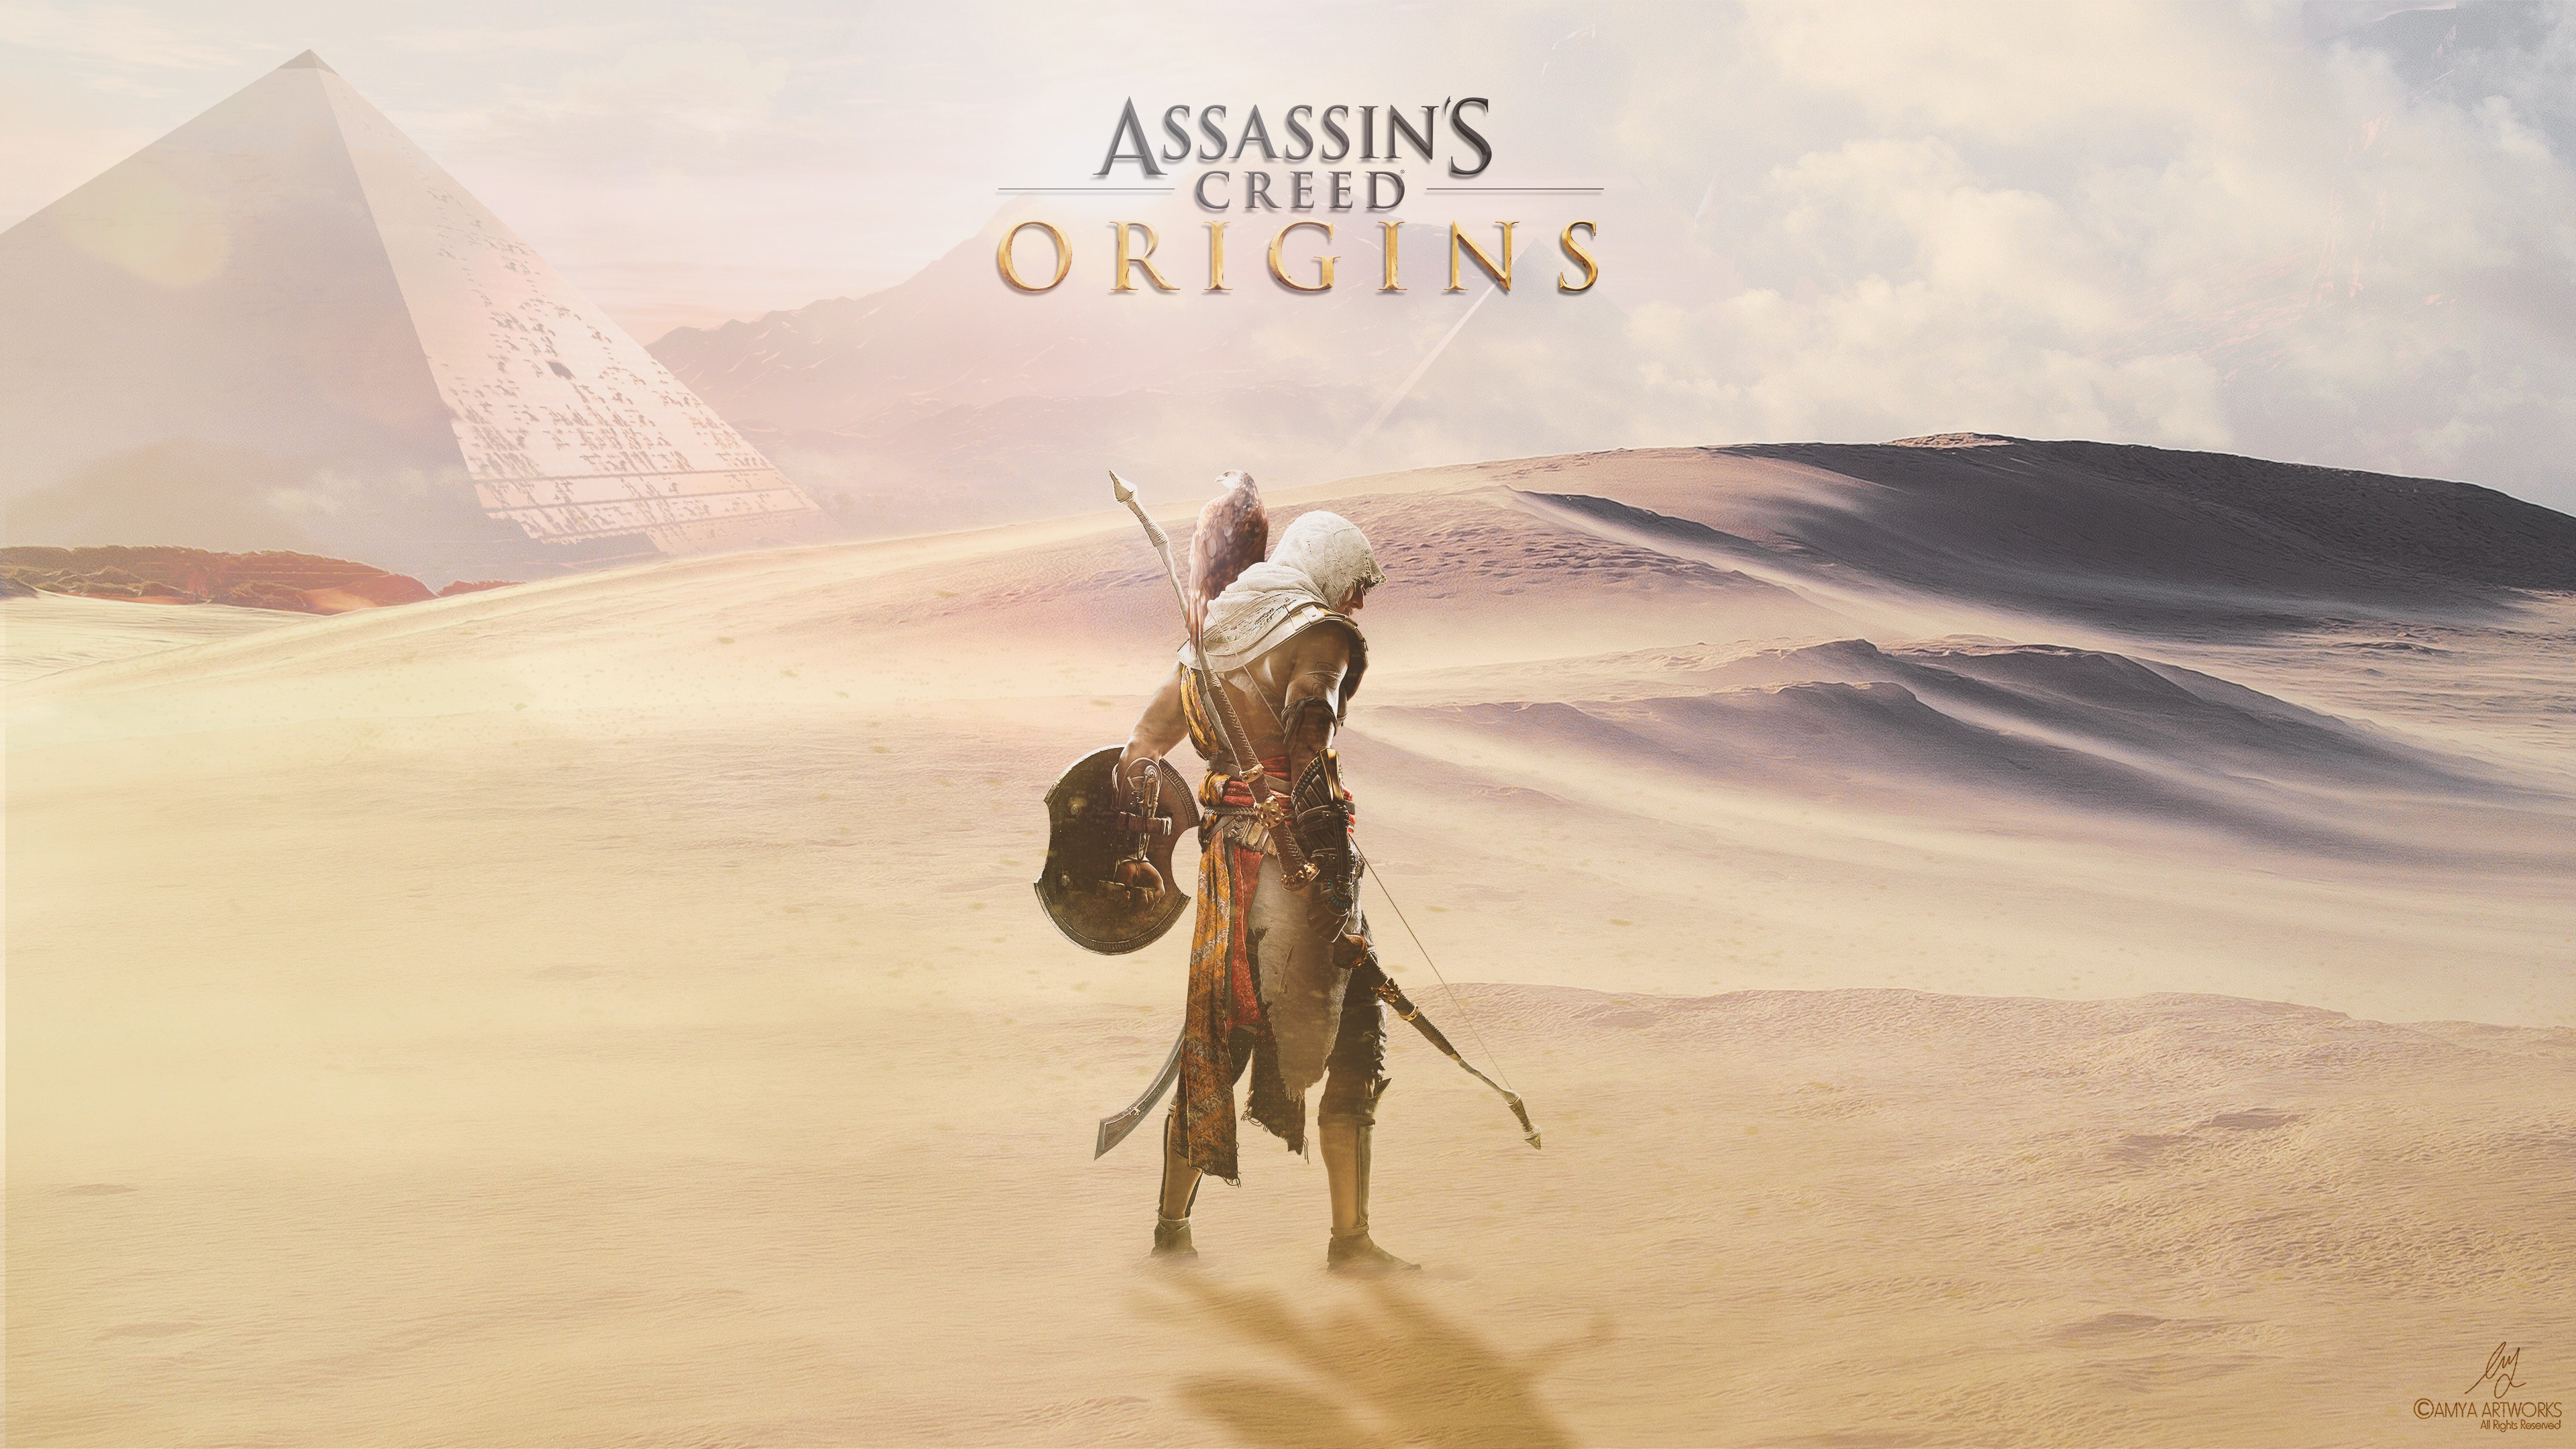 Assassins Creed Origins Wallpapers Hd Wallpapers